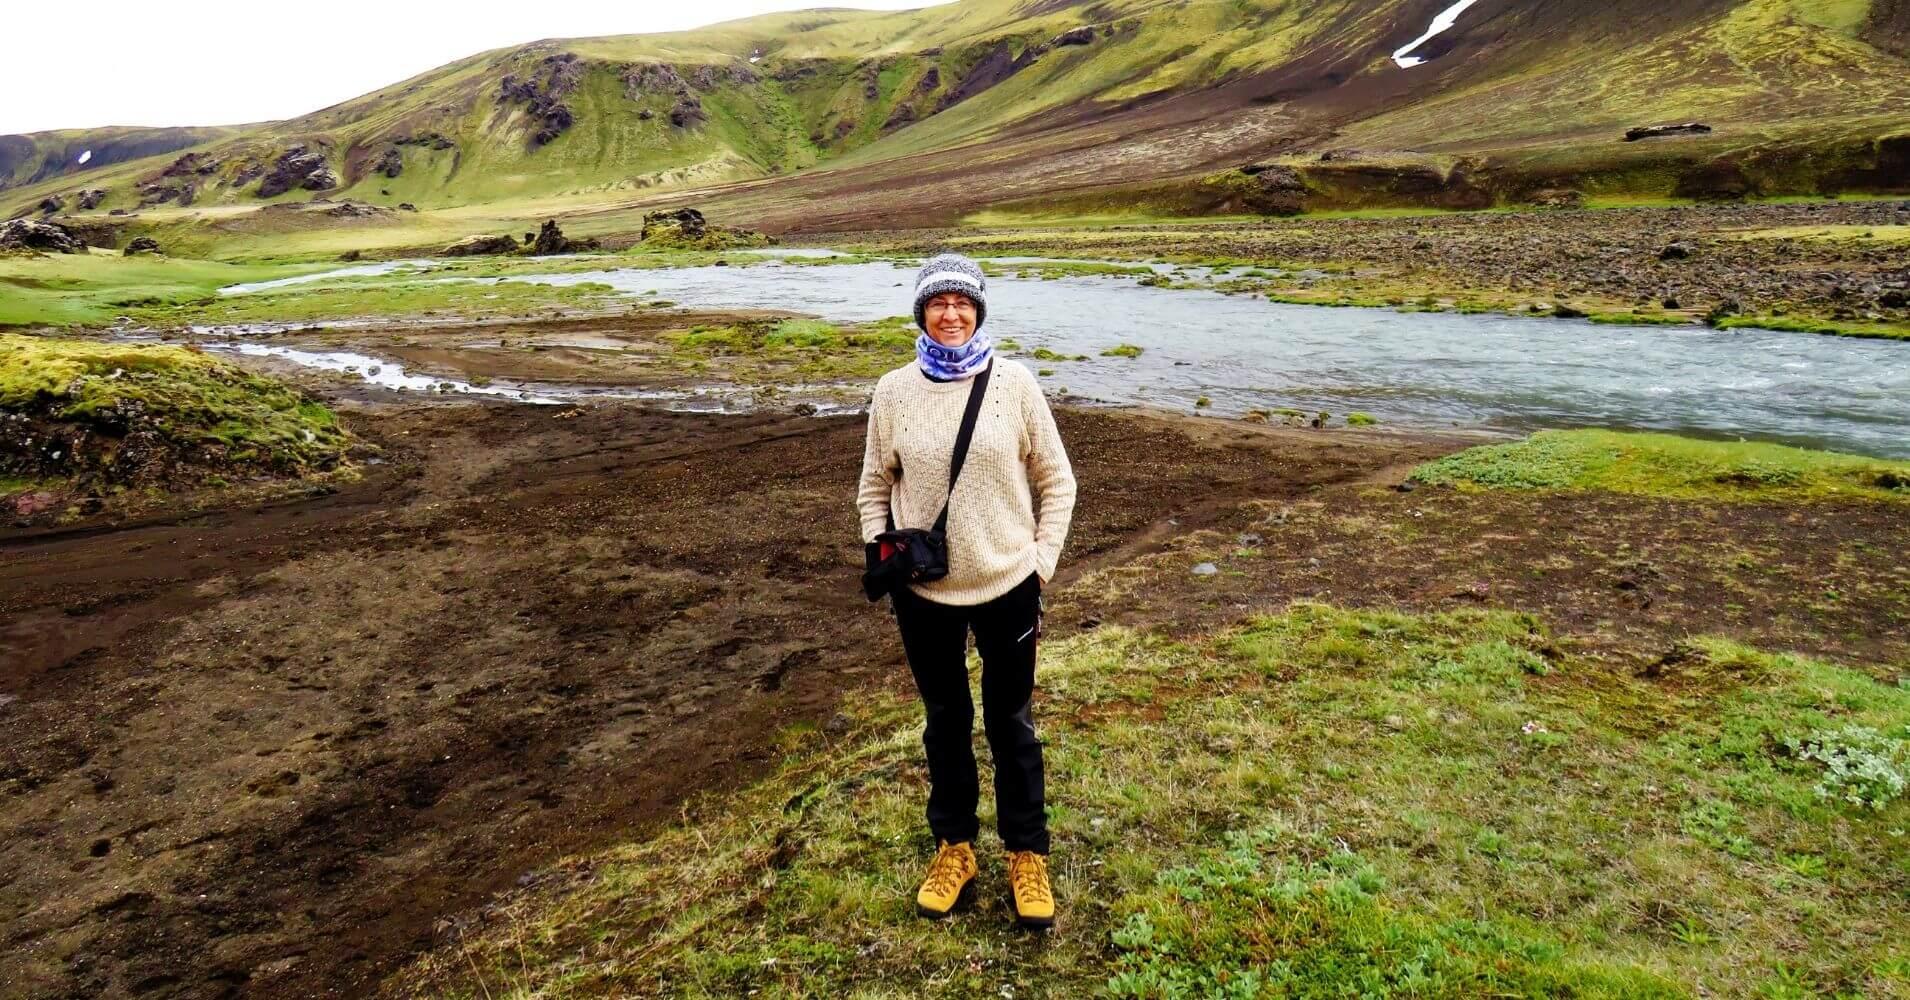 Reserva Natural Fjallabak, Landmannalaugar Tierras Altas de Islandia.